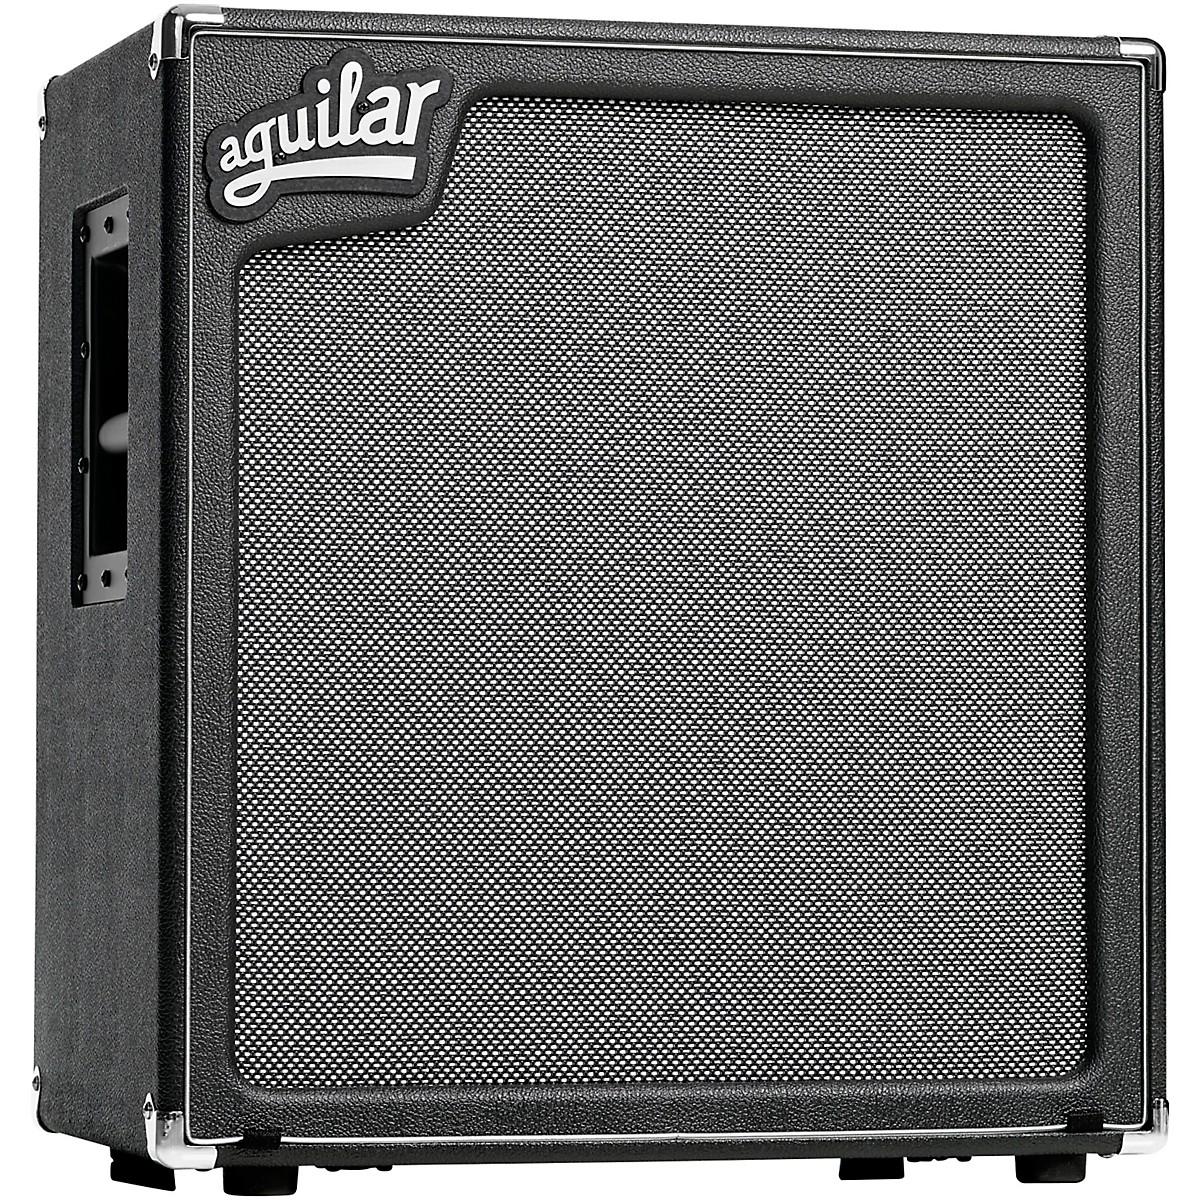 Aguilar SL 410x 800W 4x10 4 ohm Super-Light Bass Cabinet